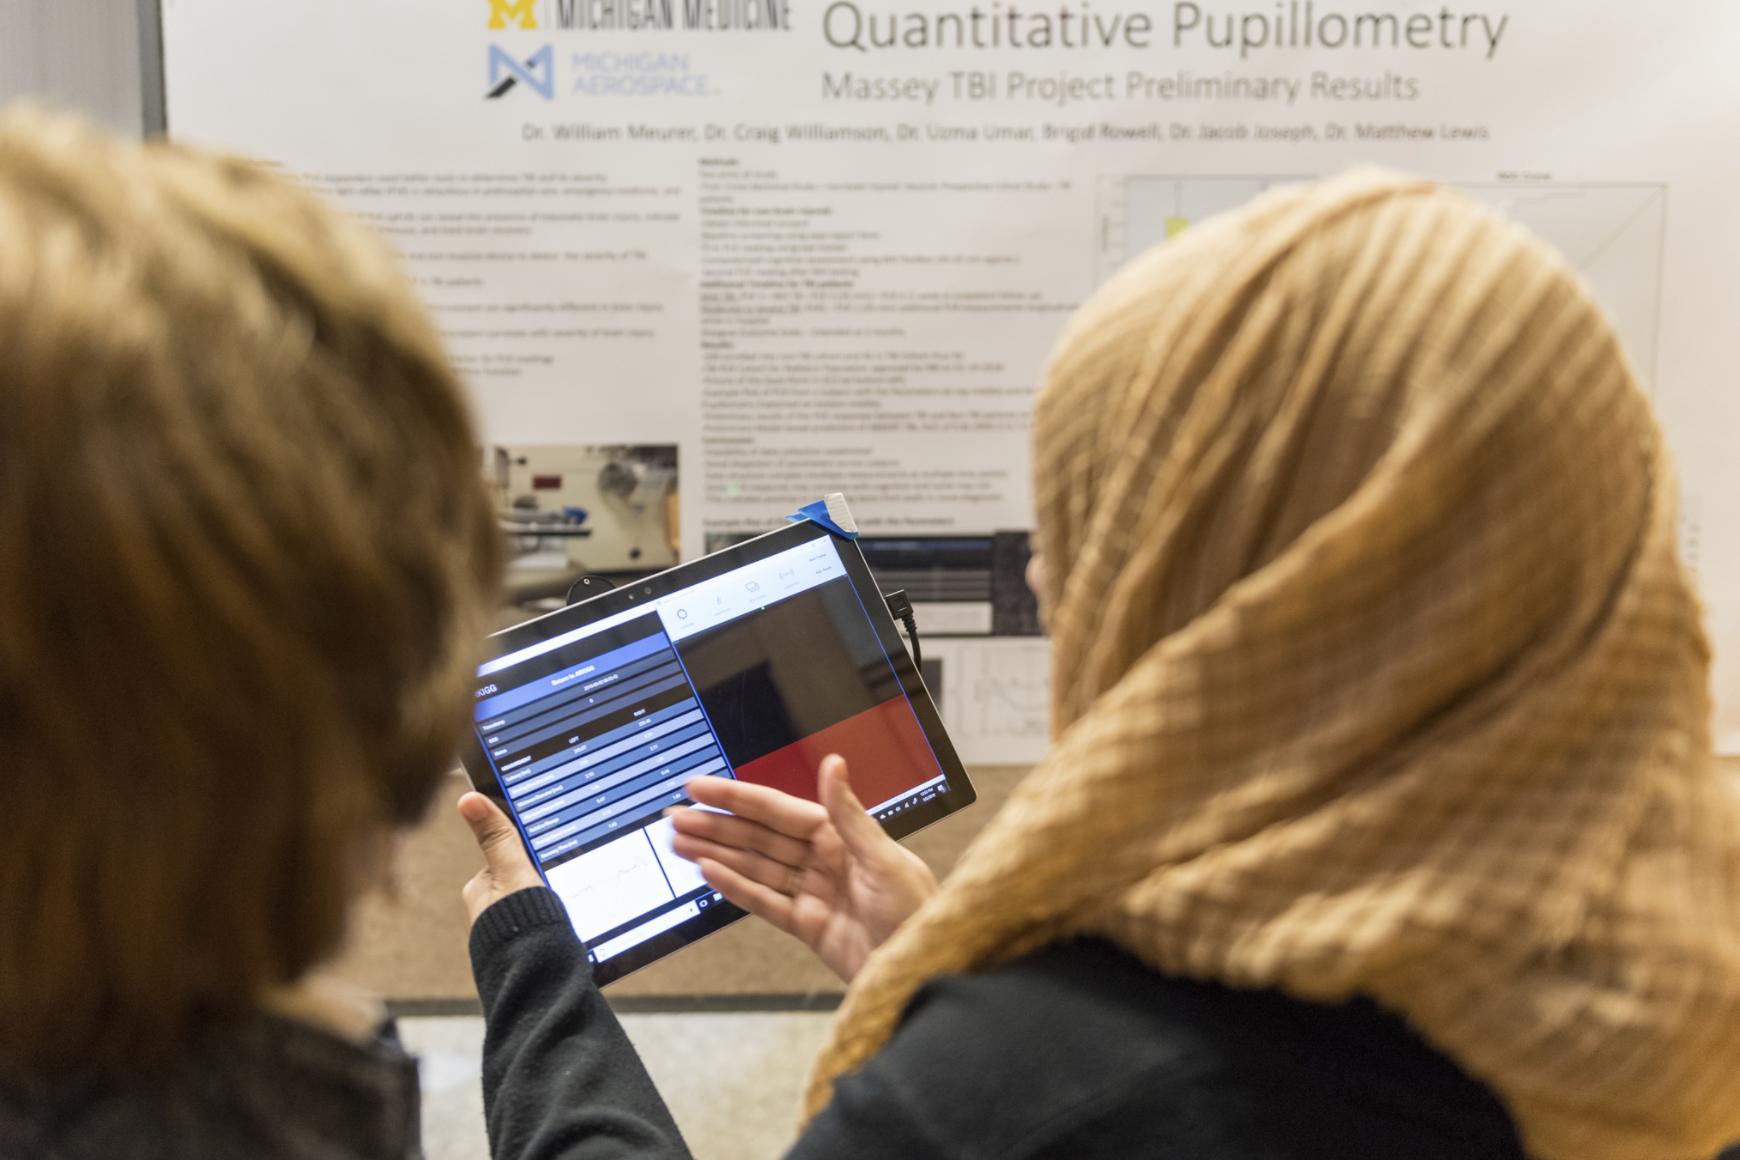 A researcher presents her quantitative pupillometry project.